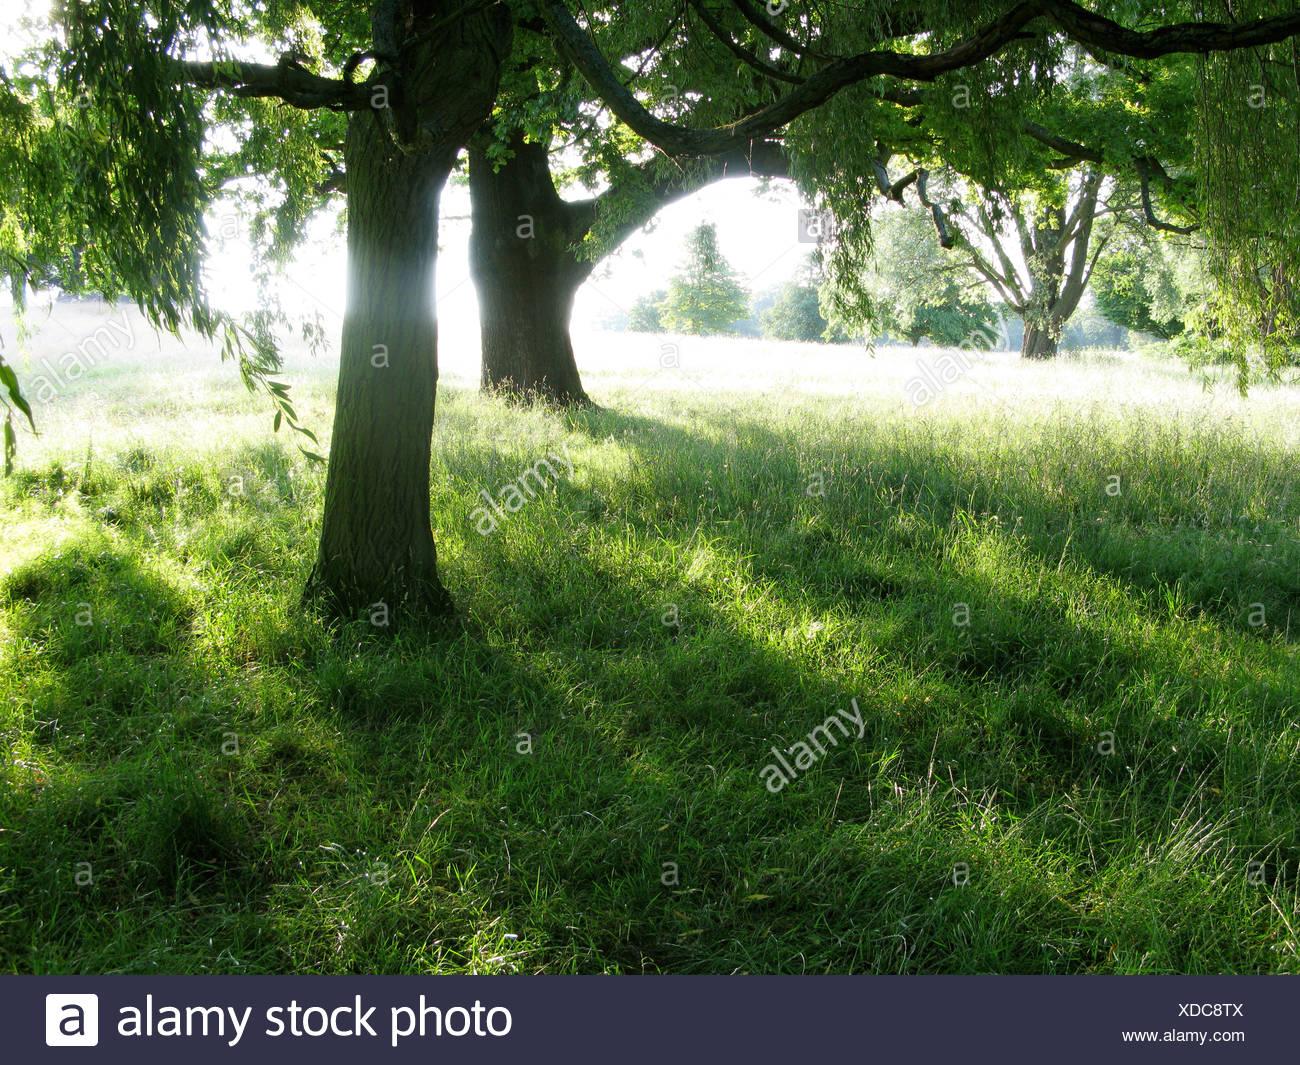 Sun shining through trees in summertime - Stock Image